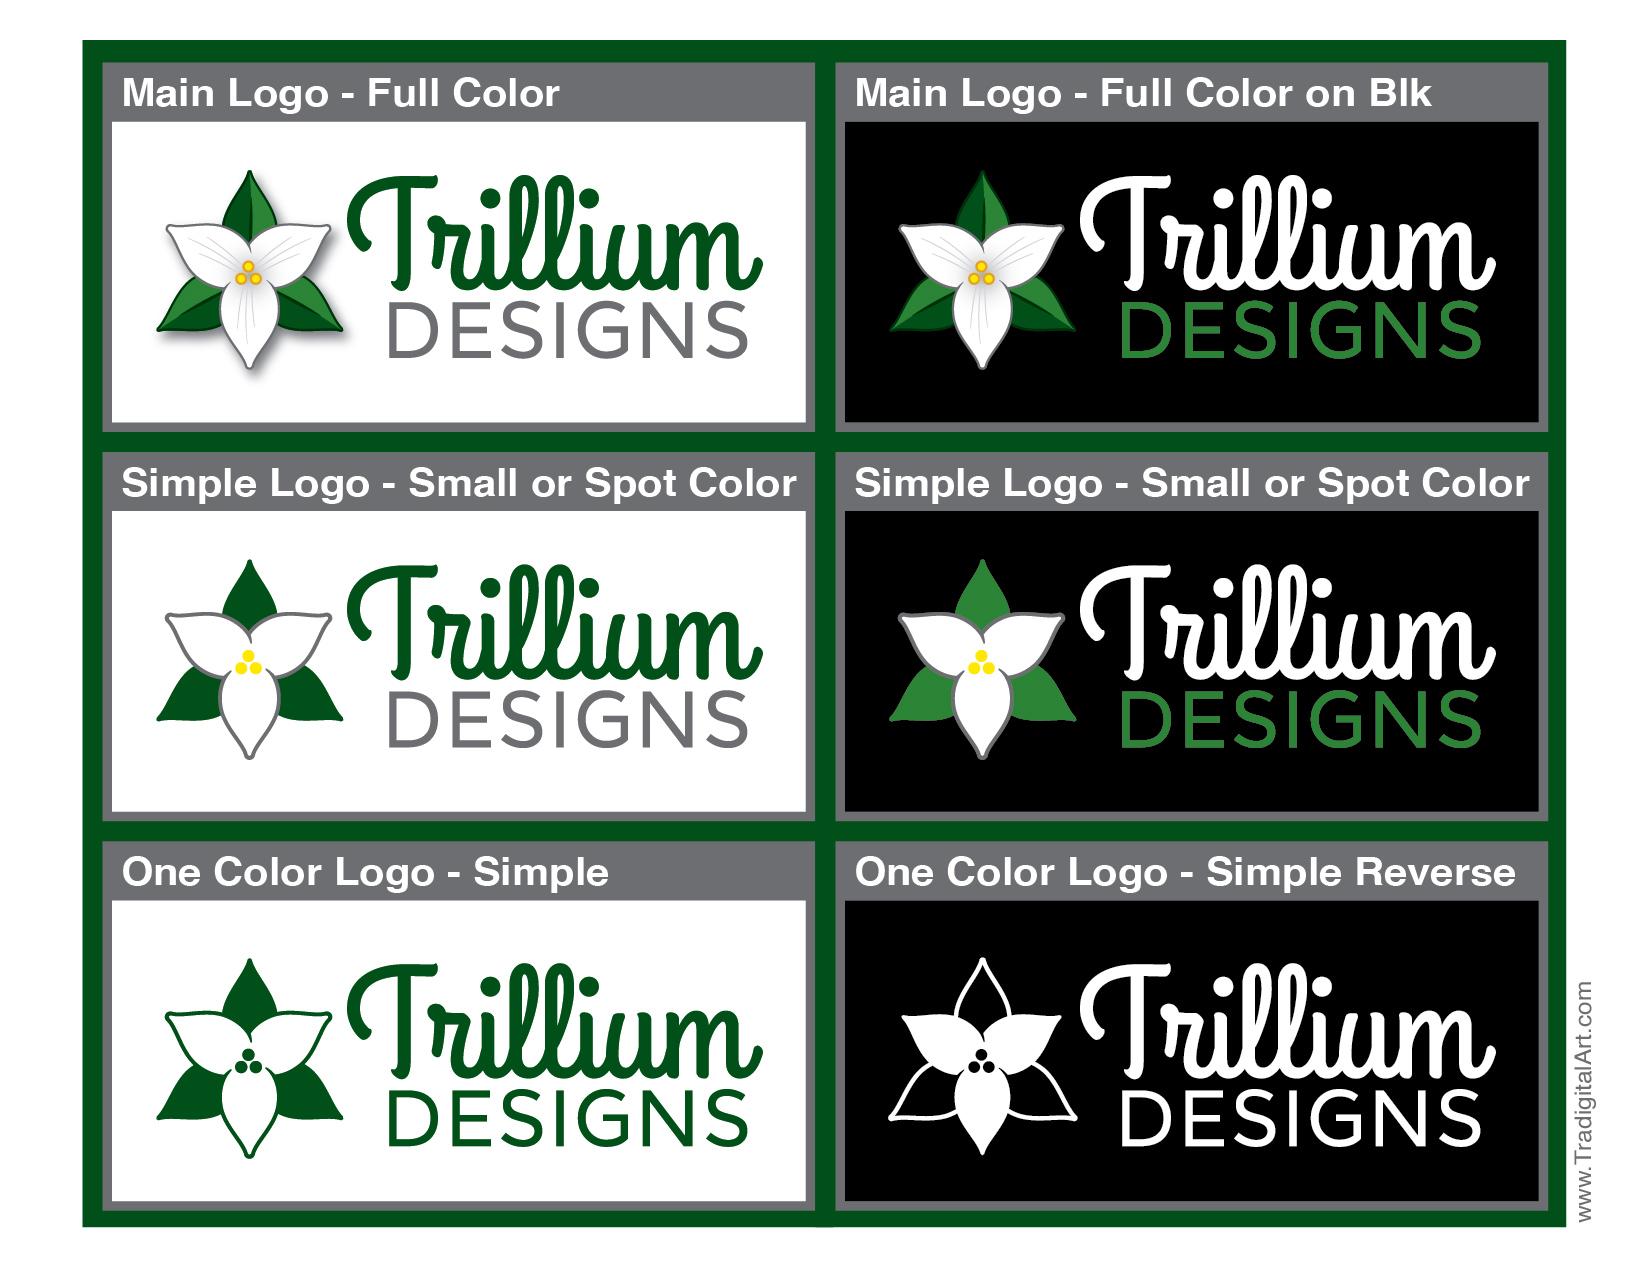 need logo help tradigital art designs by steven crawley